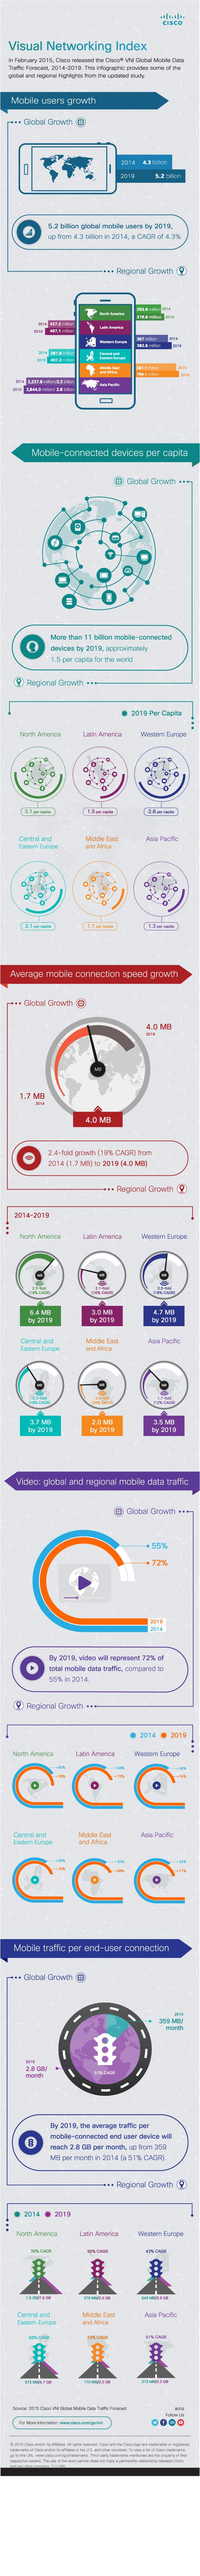 Cisco VNI Complete IP Traffic Forecast 2014 – 2019